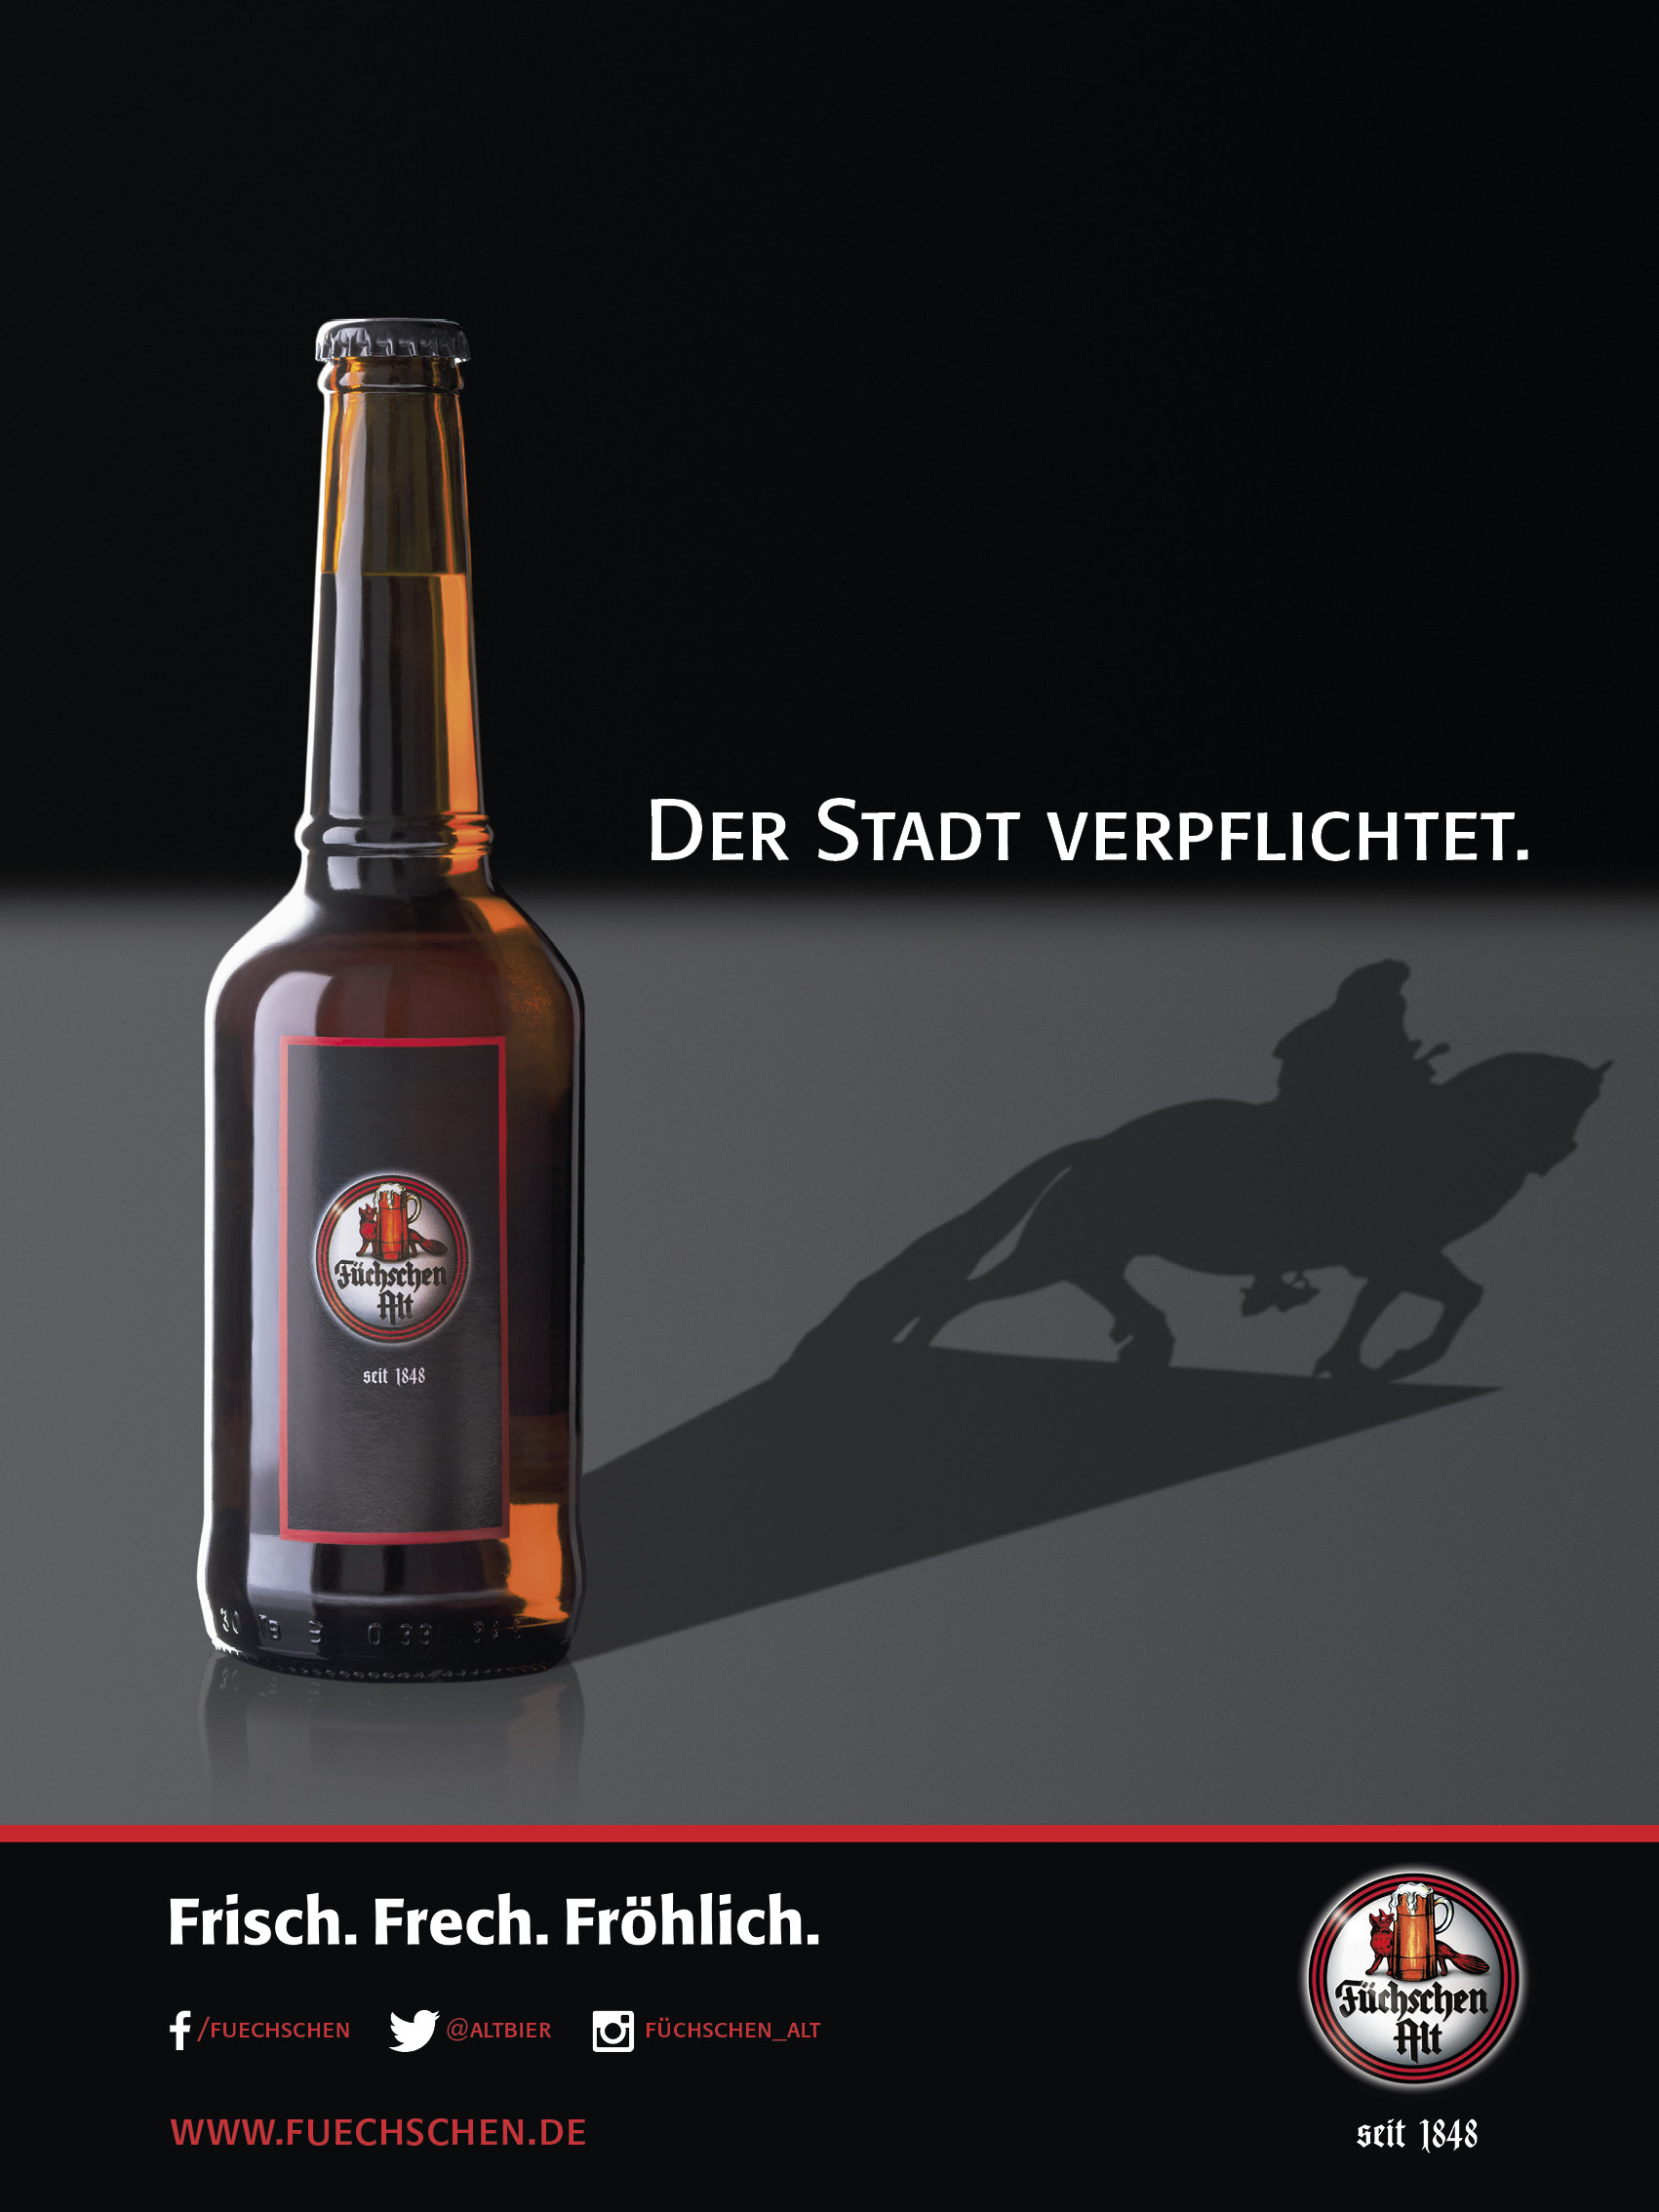 Fuechschen_Poster_JanWellem_60x80_DerStadt.jpg